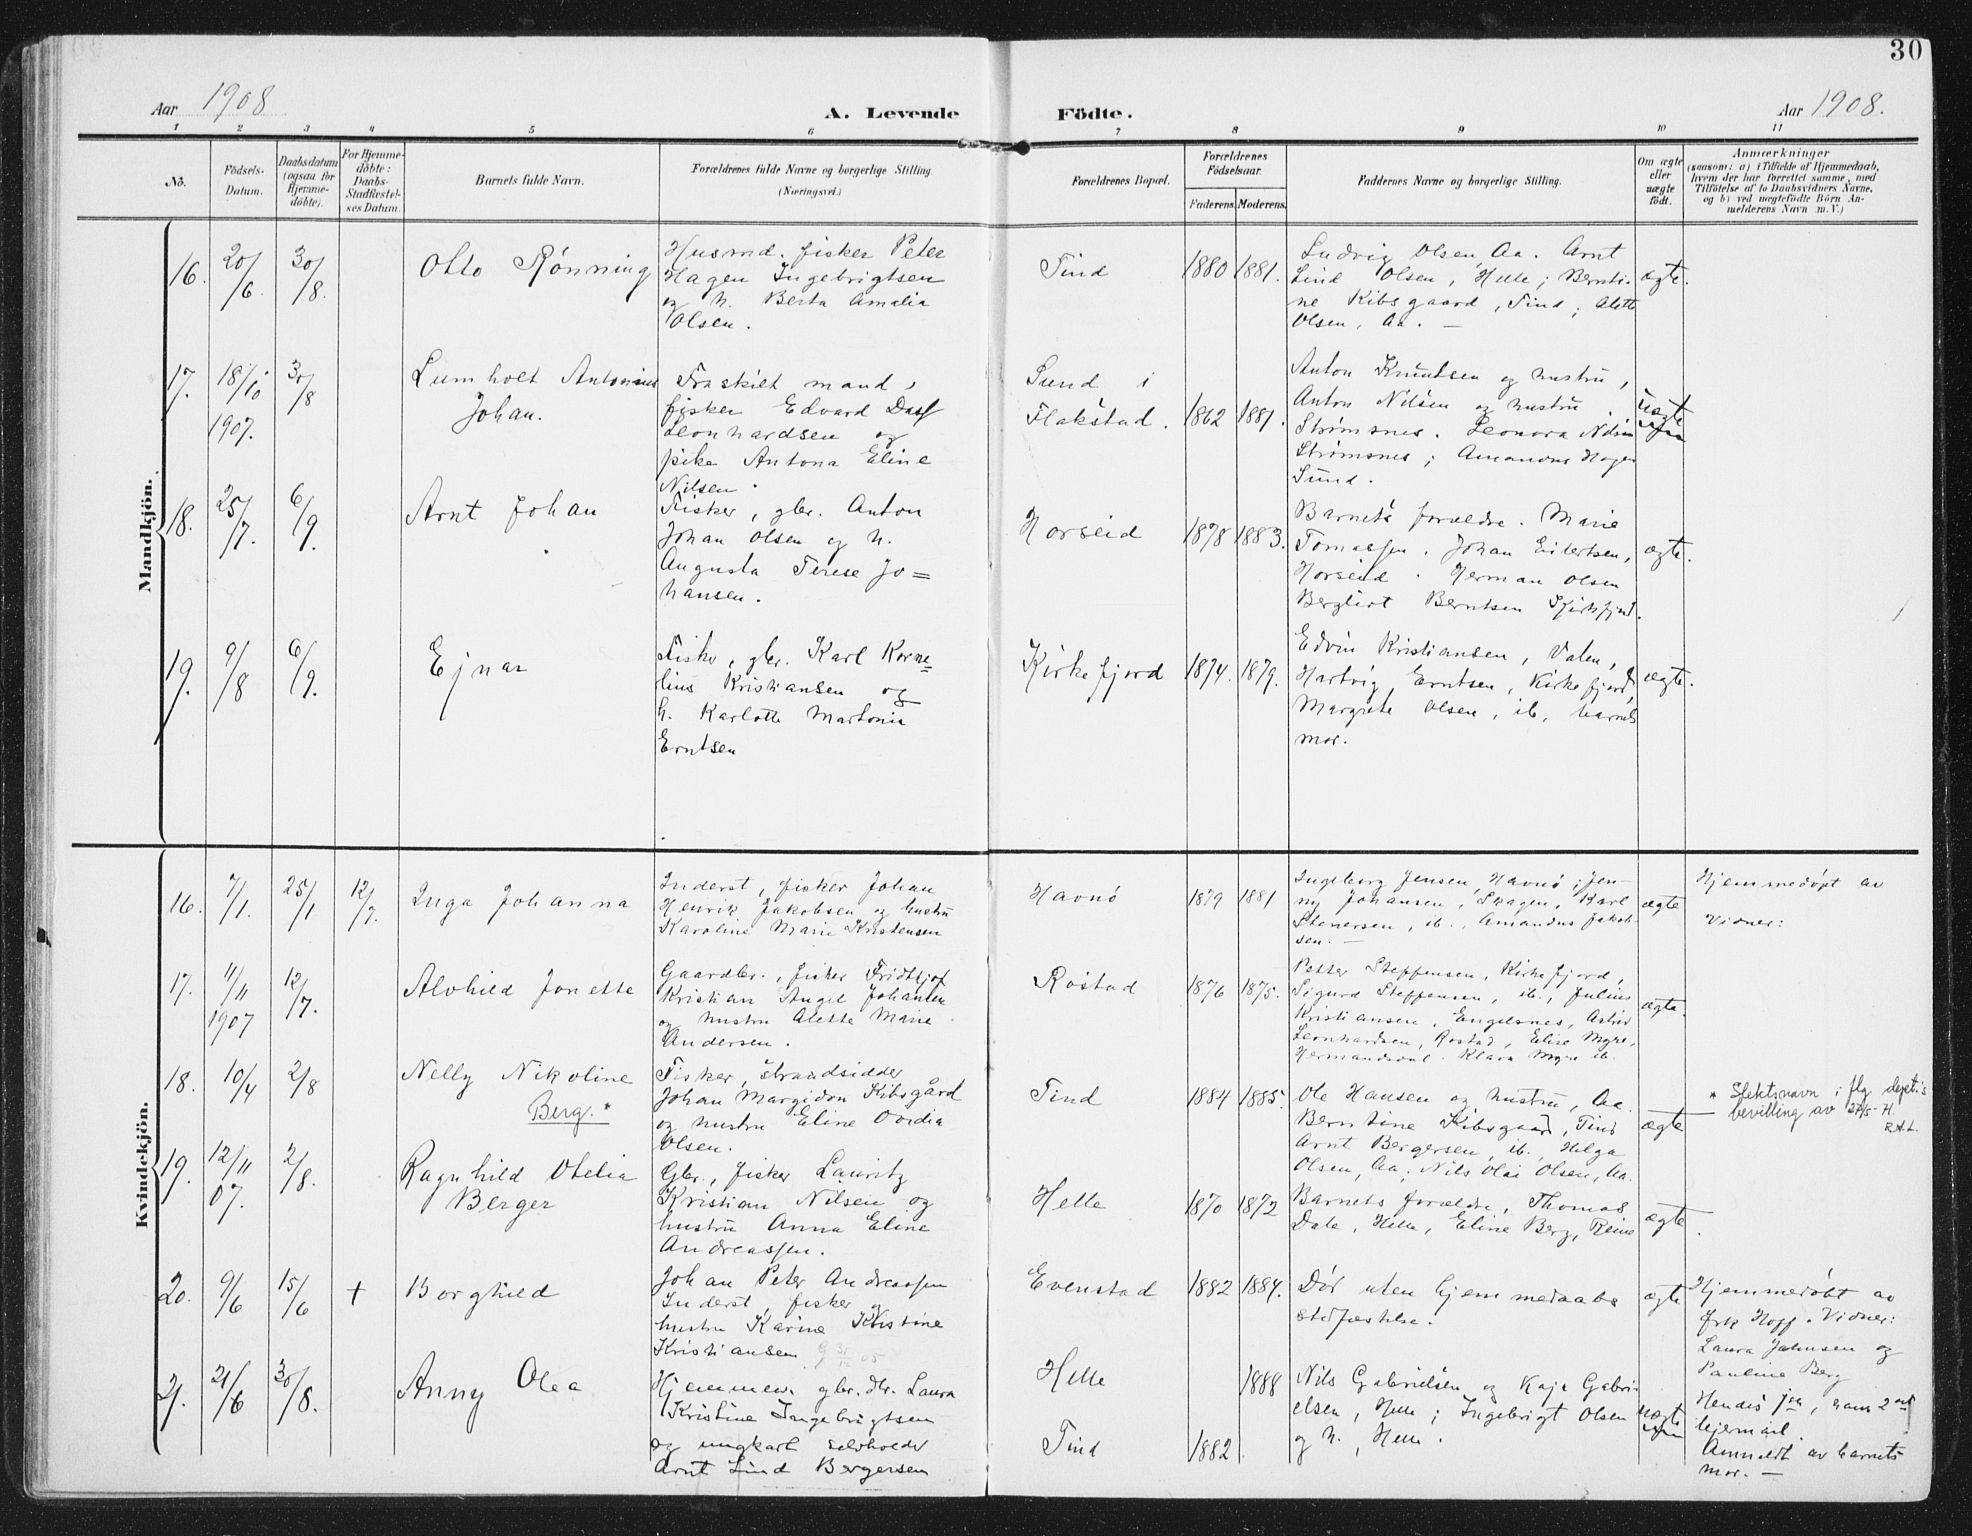 SAT, Ministerialprotokoller, klokkerbøker og fødselsregistre - Nordland, 886/L1221: Ministerialbok nr. 886A03, 1903-1913, s. 30